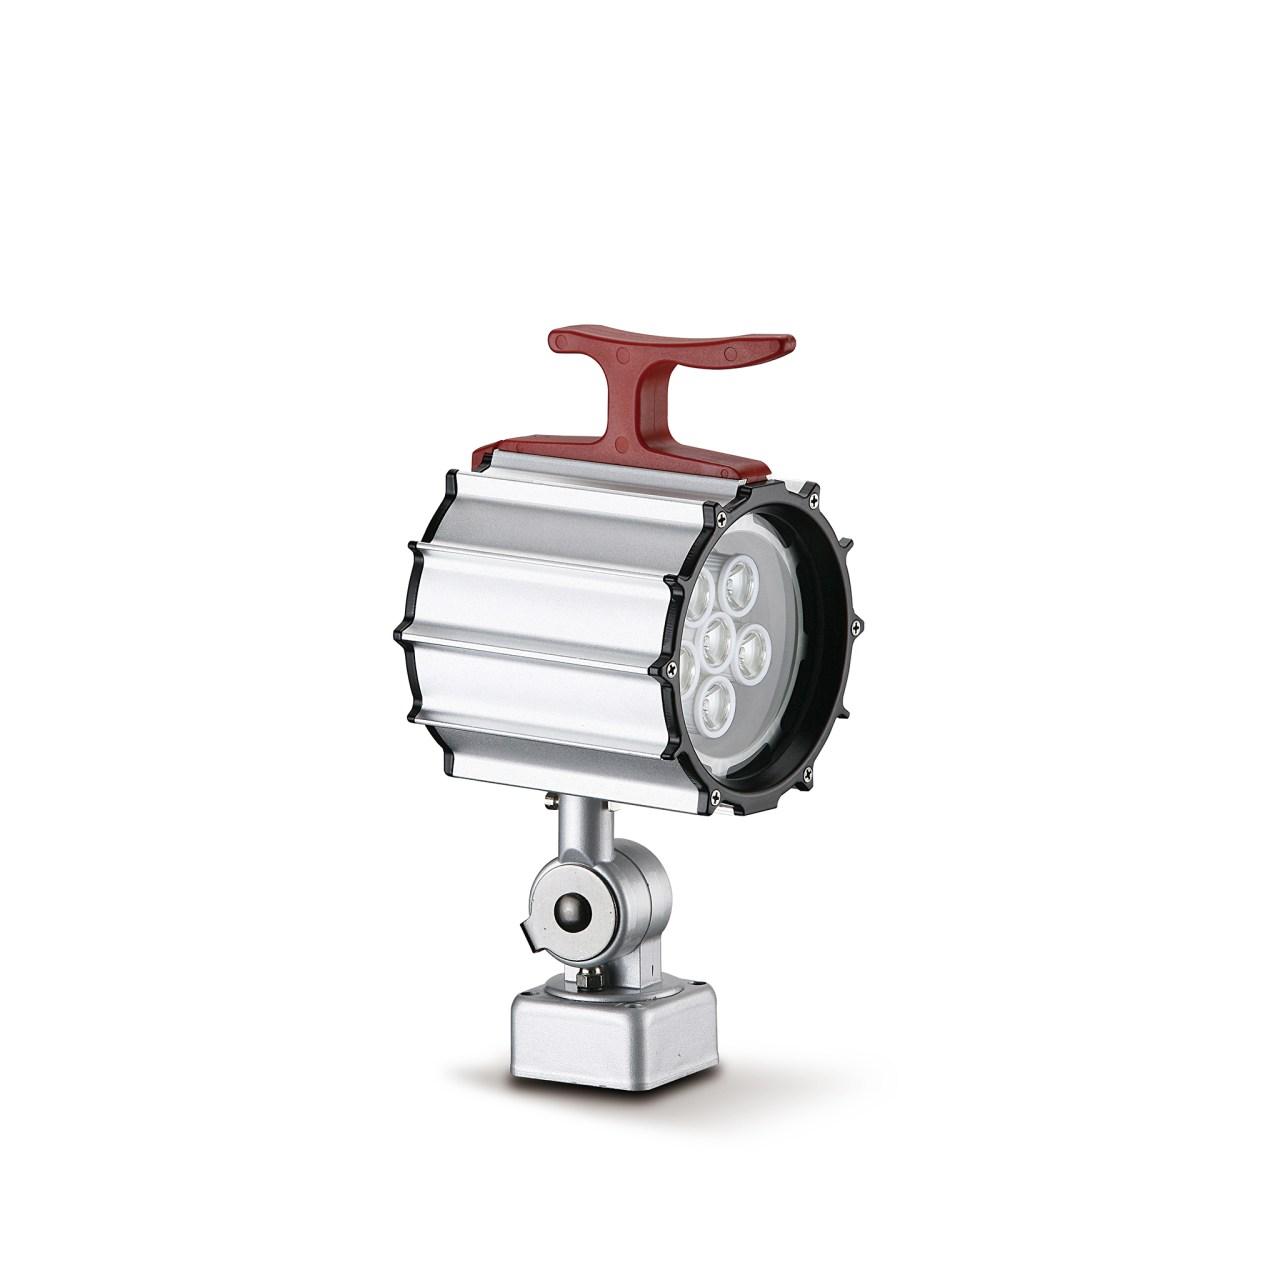 LED-Maschinenleuchte SIS-Licht M-Lite IP 65 RS